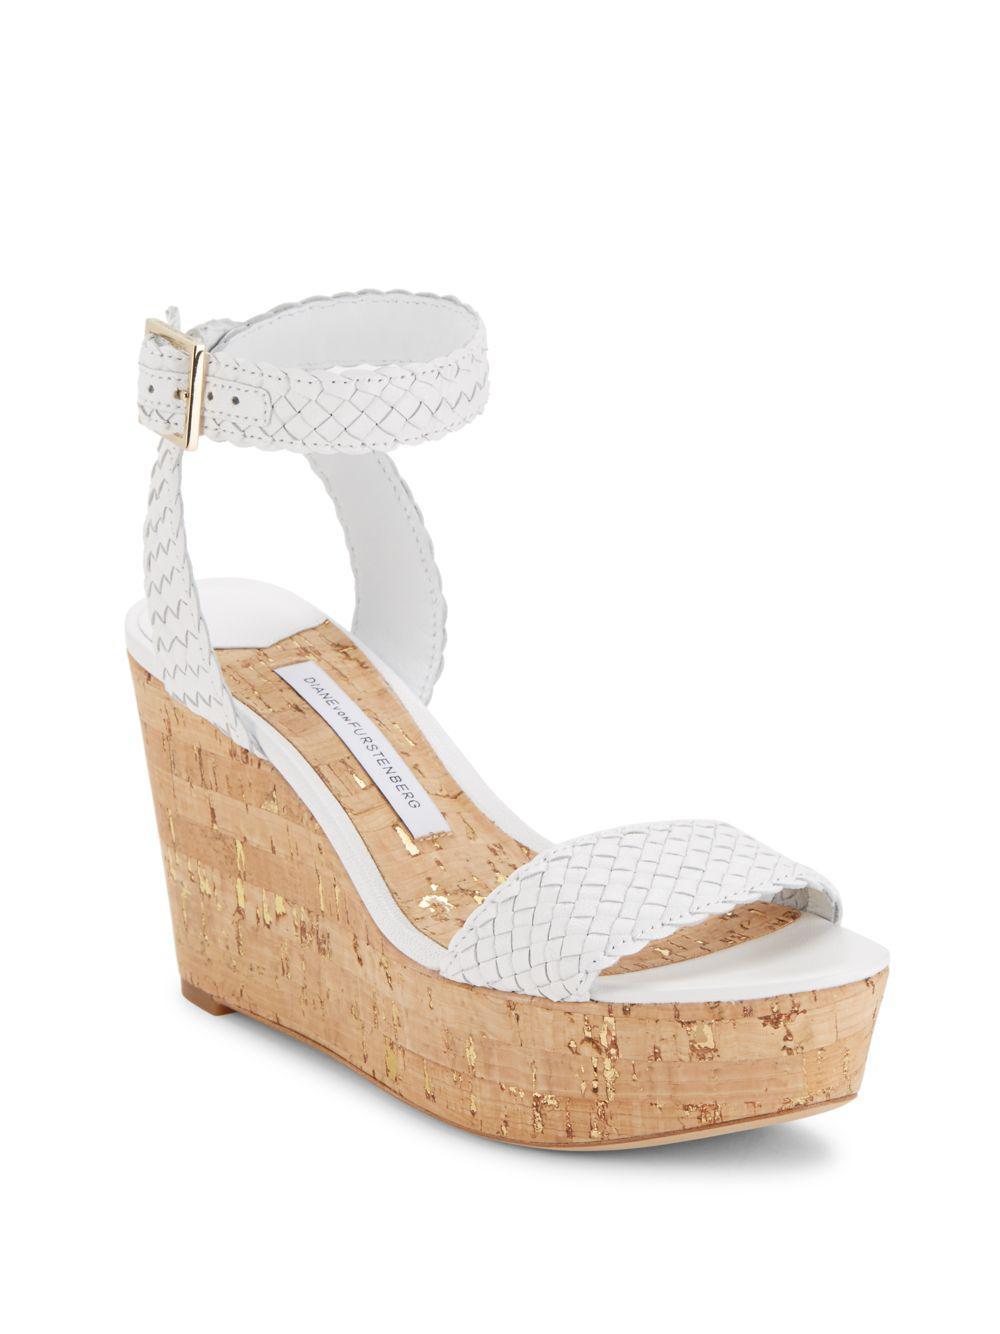 8fa08d89aa7 Lyst - Diane von Furstenberg Montclair Leather Ankle Strap Wedges in ...